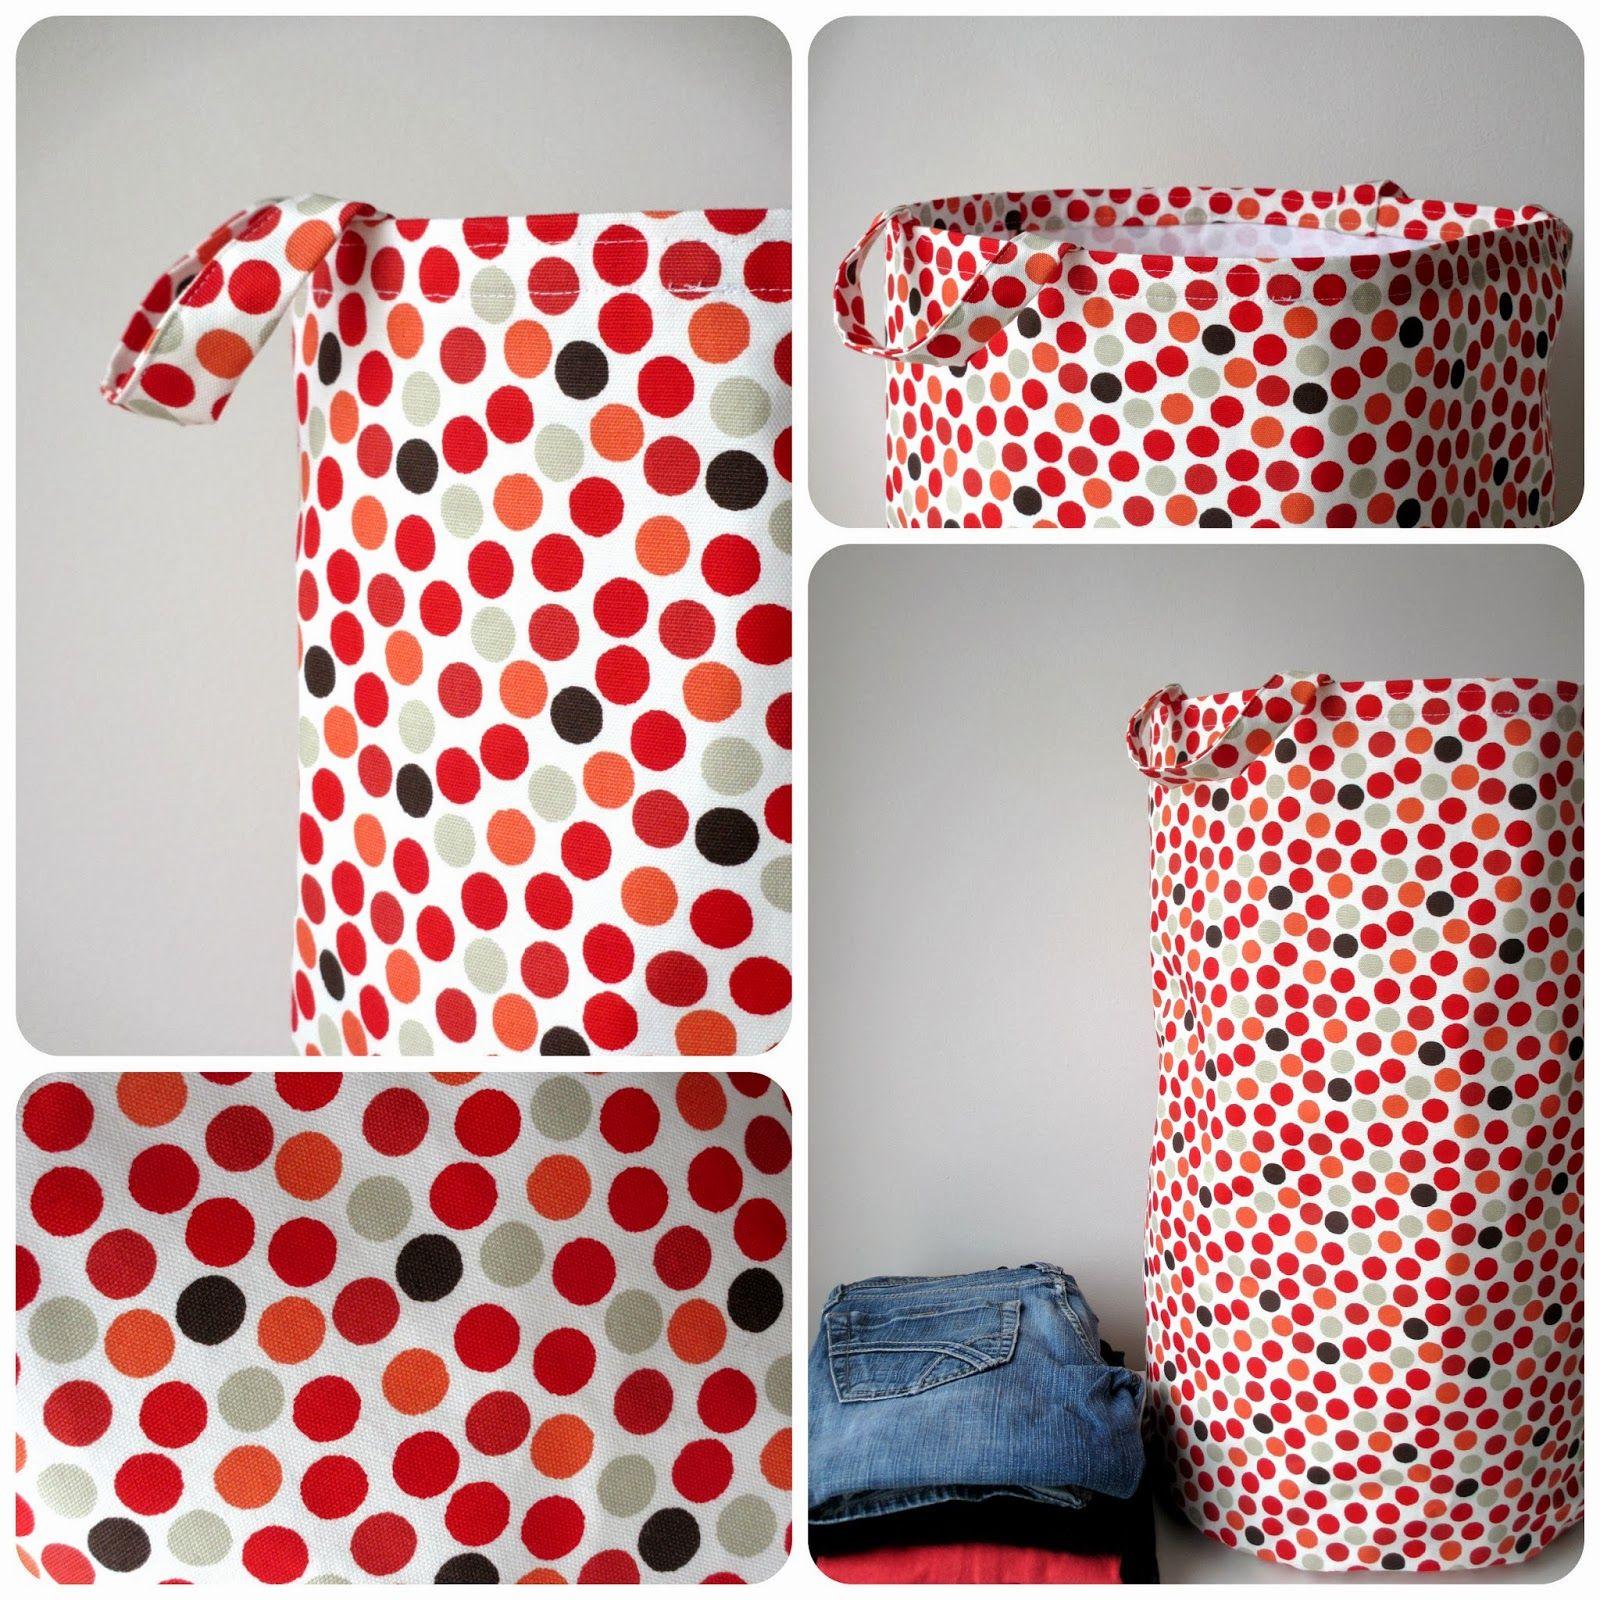 tadaam diy tuto sac de rangement en tissu couture pinterest rangement tissu. Black Bedroom Furniture Sets. Home Design Ideas